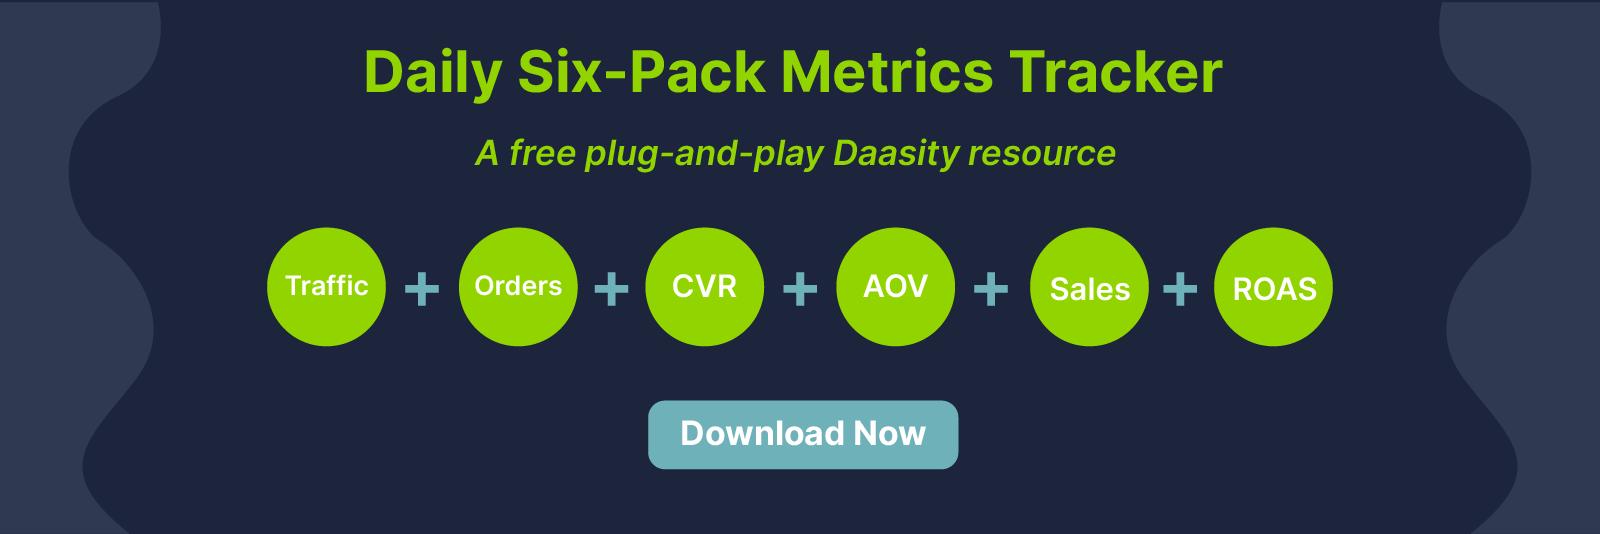 Daasity's free six-pack ecommerce metrics tracker